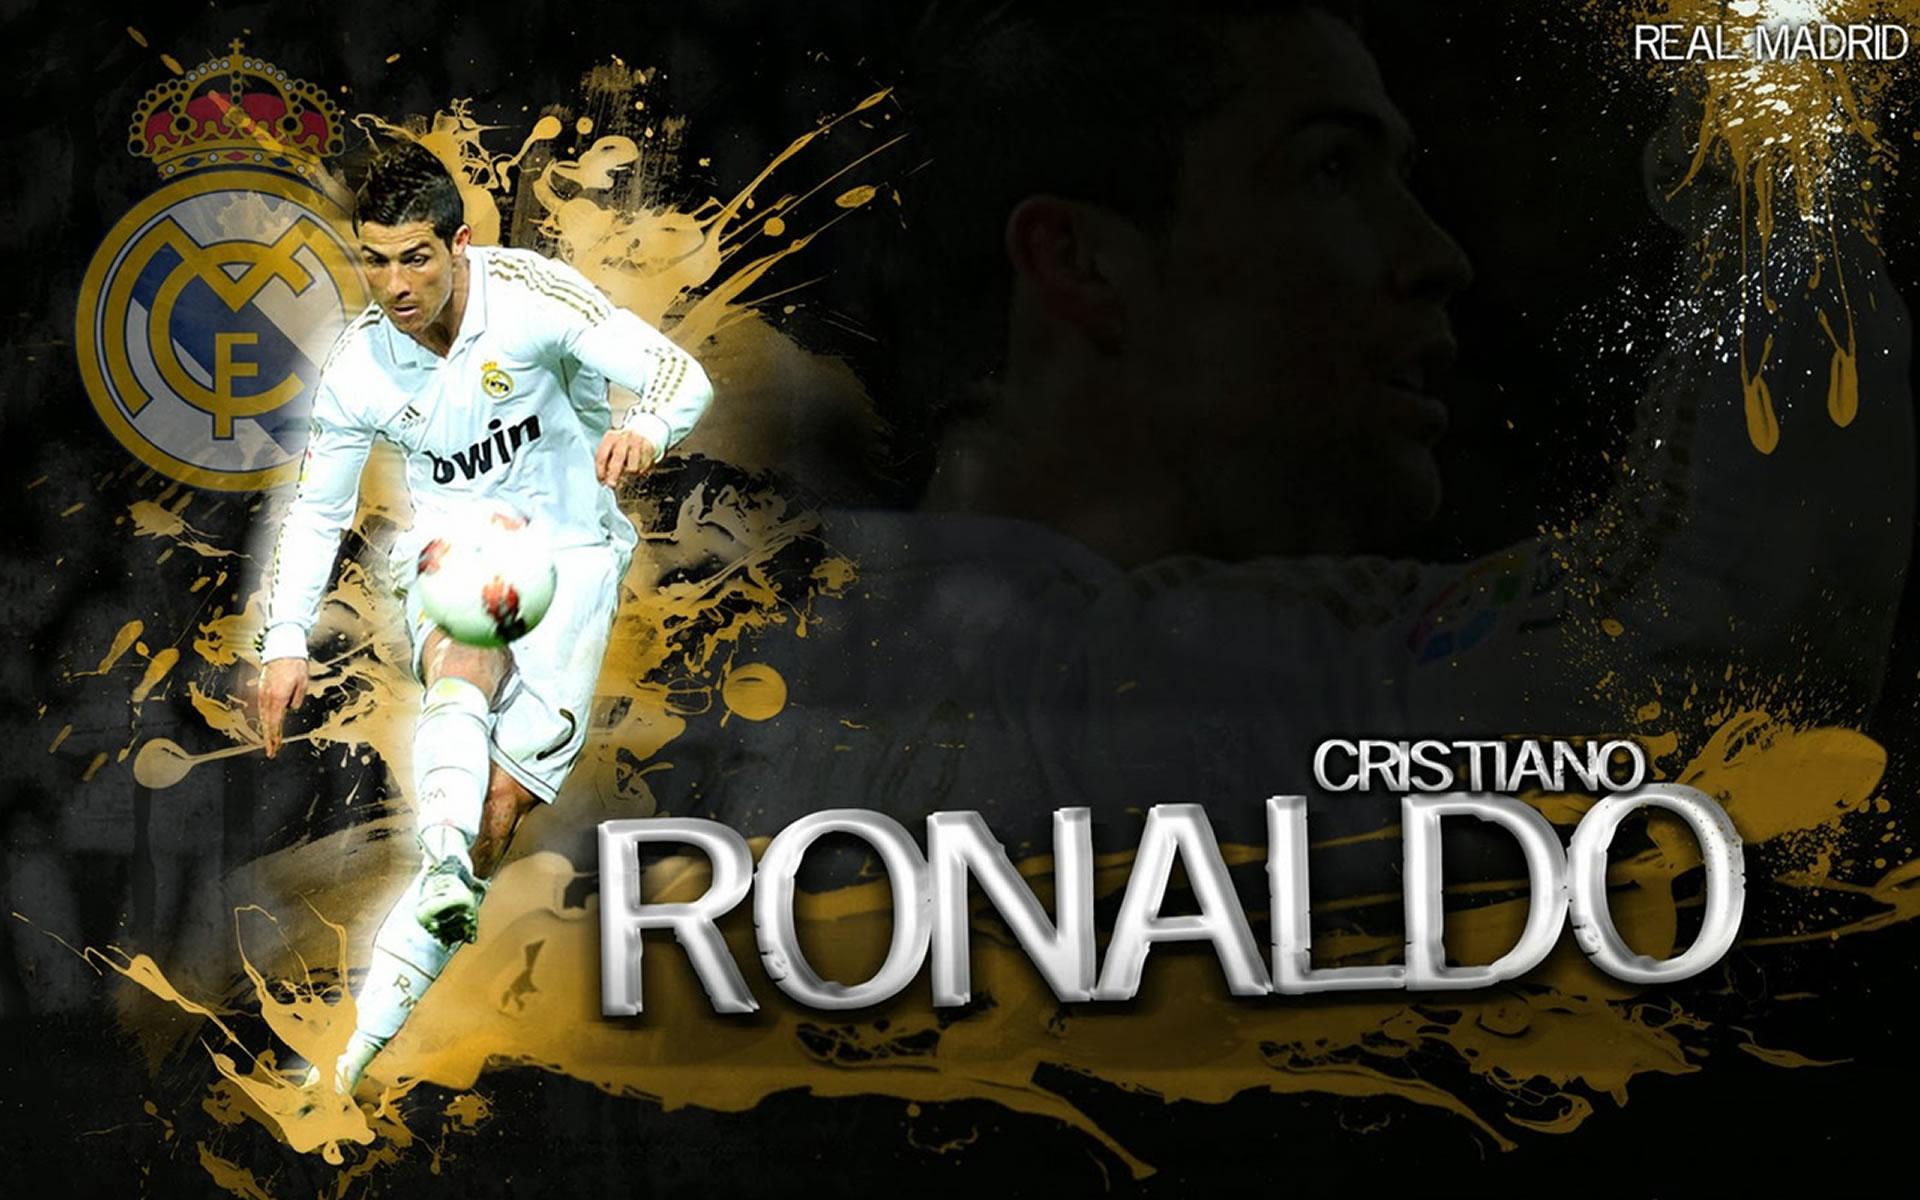 Cristiano Ronaldo Wallpaper Real Madrid 2015